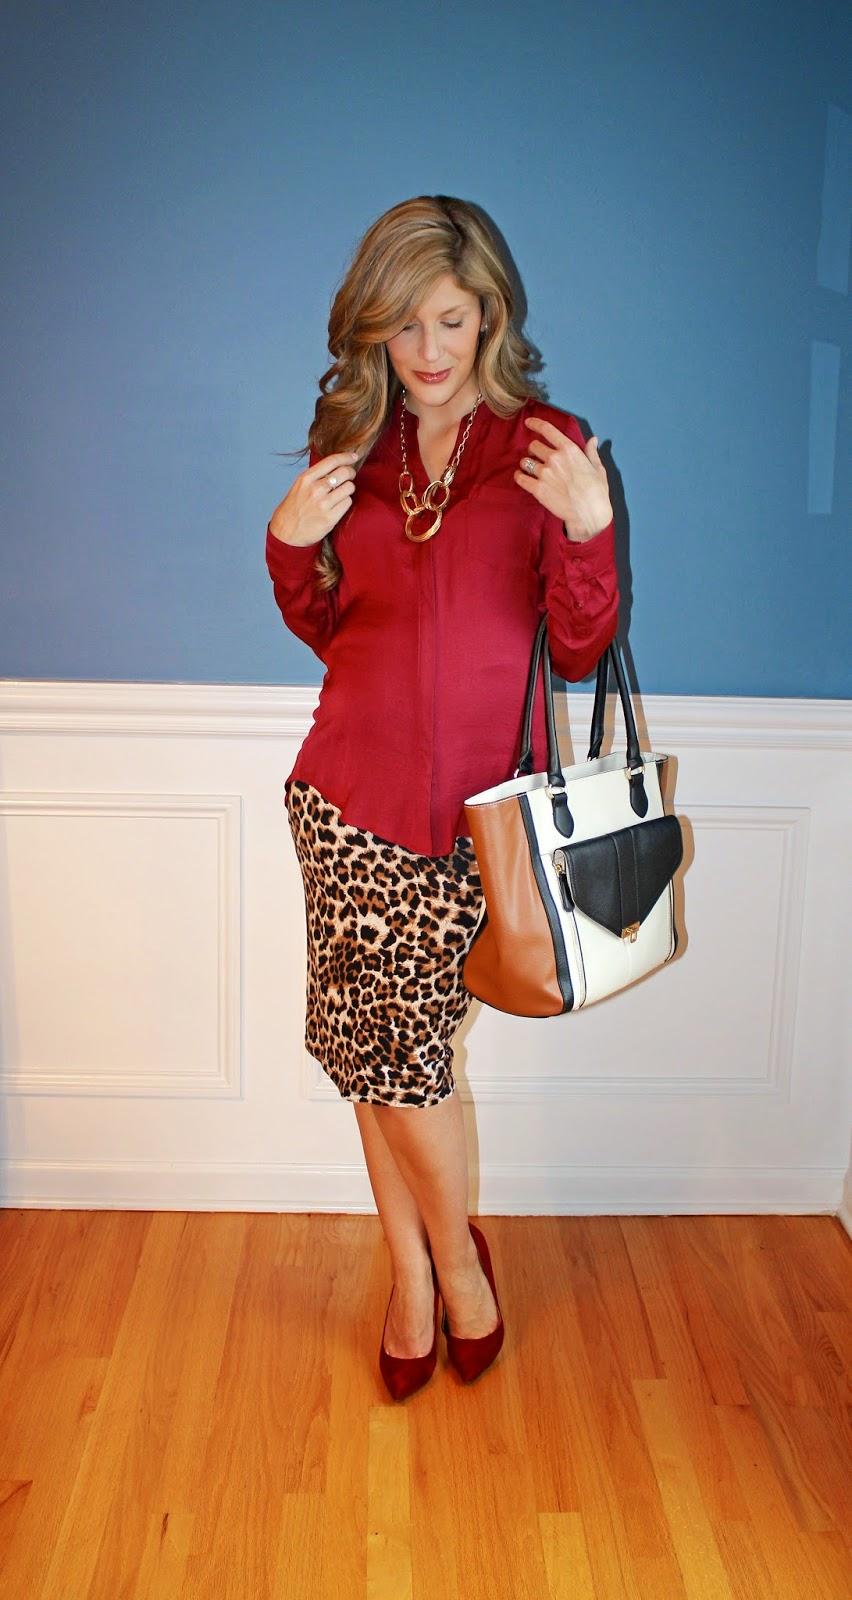 dc56fdbad85 What I m wearing...blouse  Apt. 9 (Kohl s)